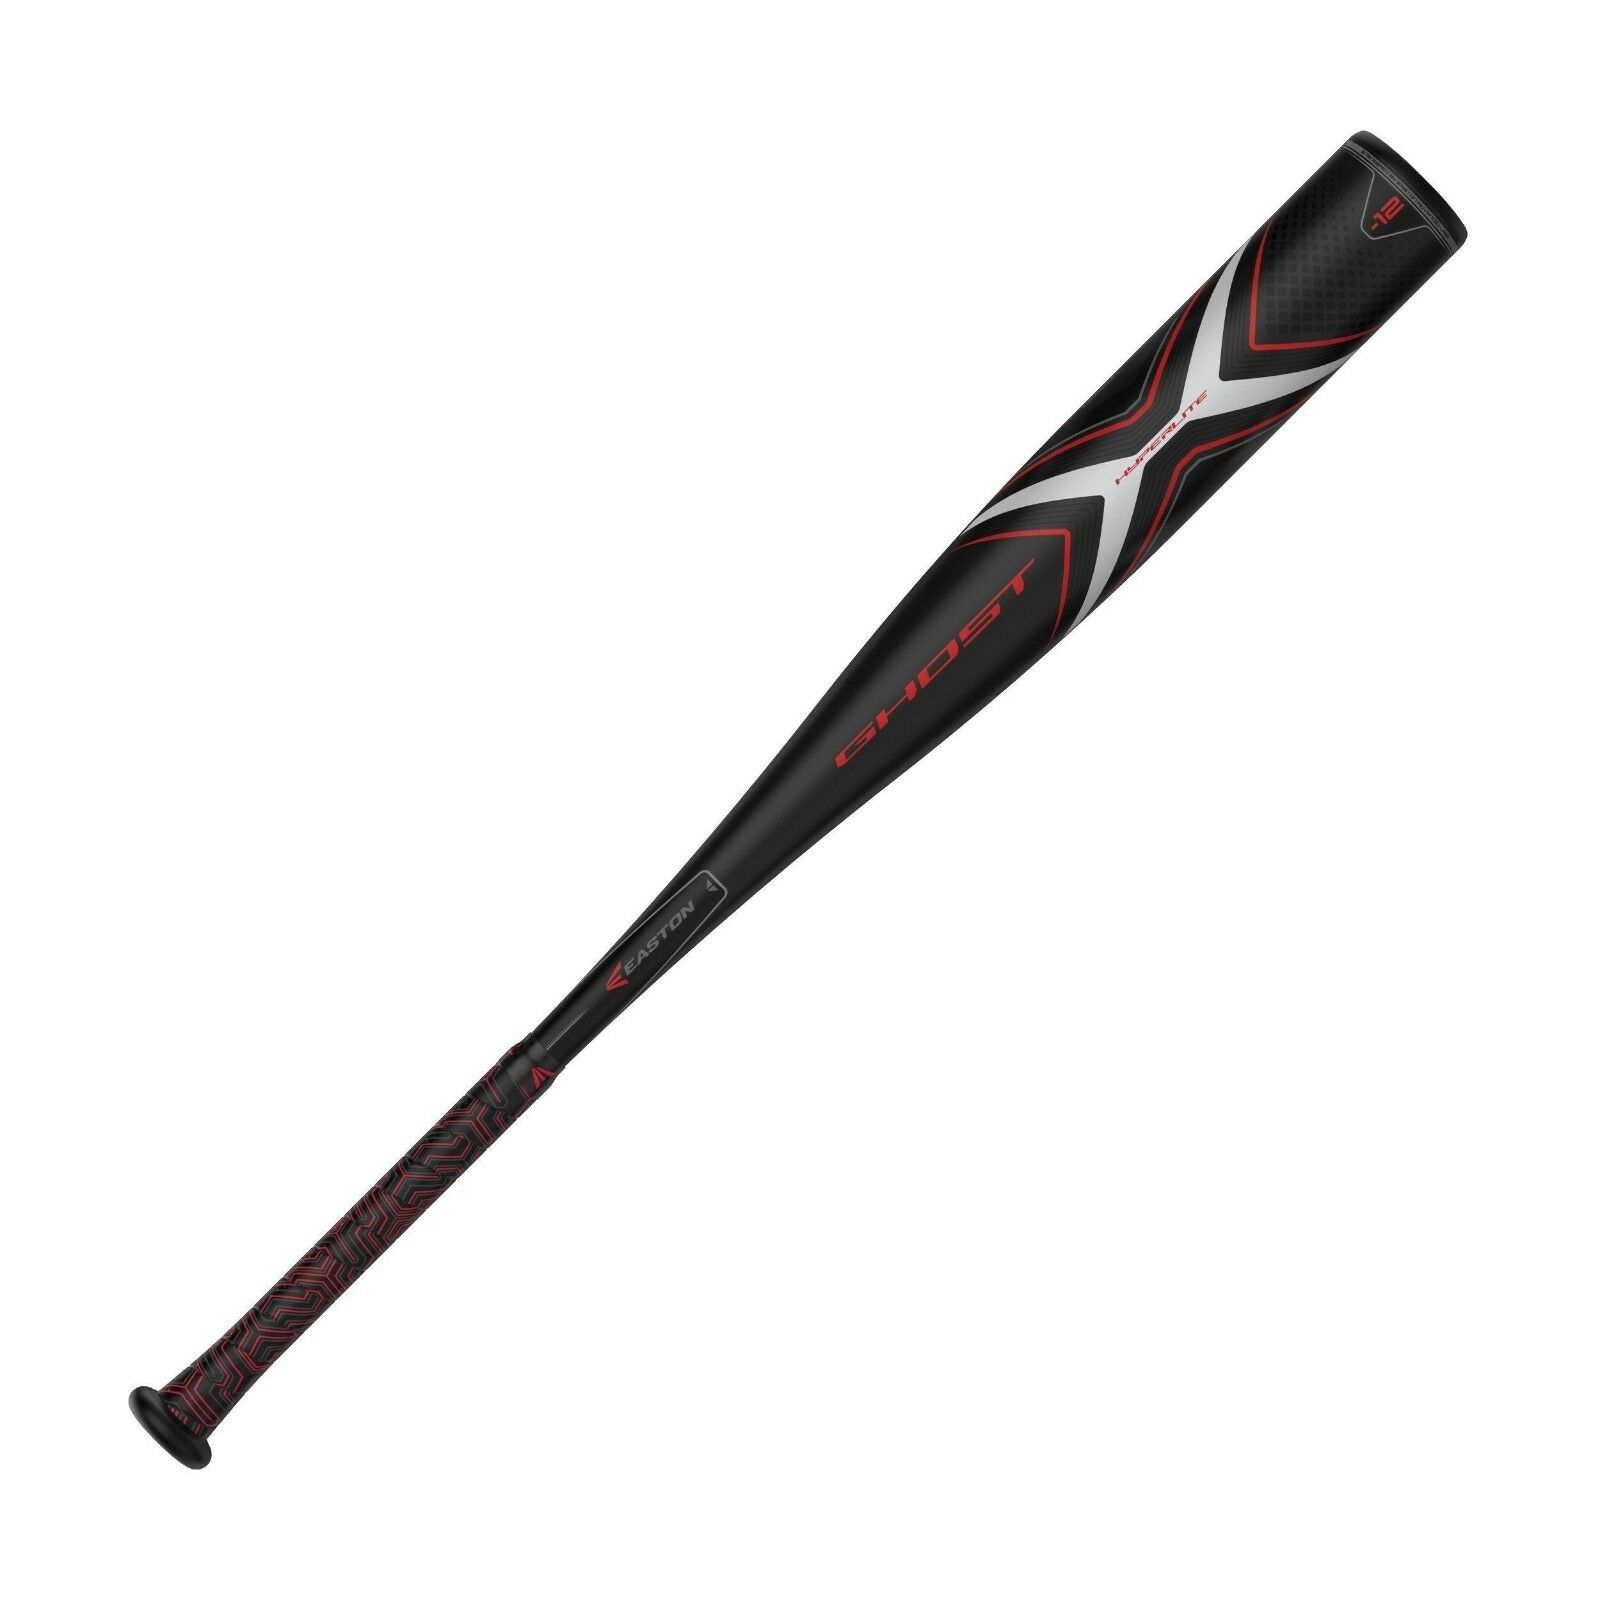 2019 Easton Ghost X Hyperlite USSSA 2 3 4 Youth Baseball Bat 31 19 SL19GXHL12